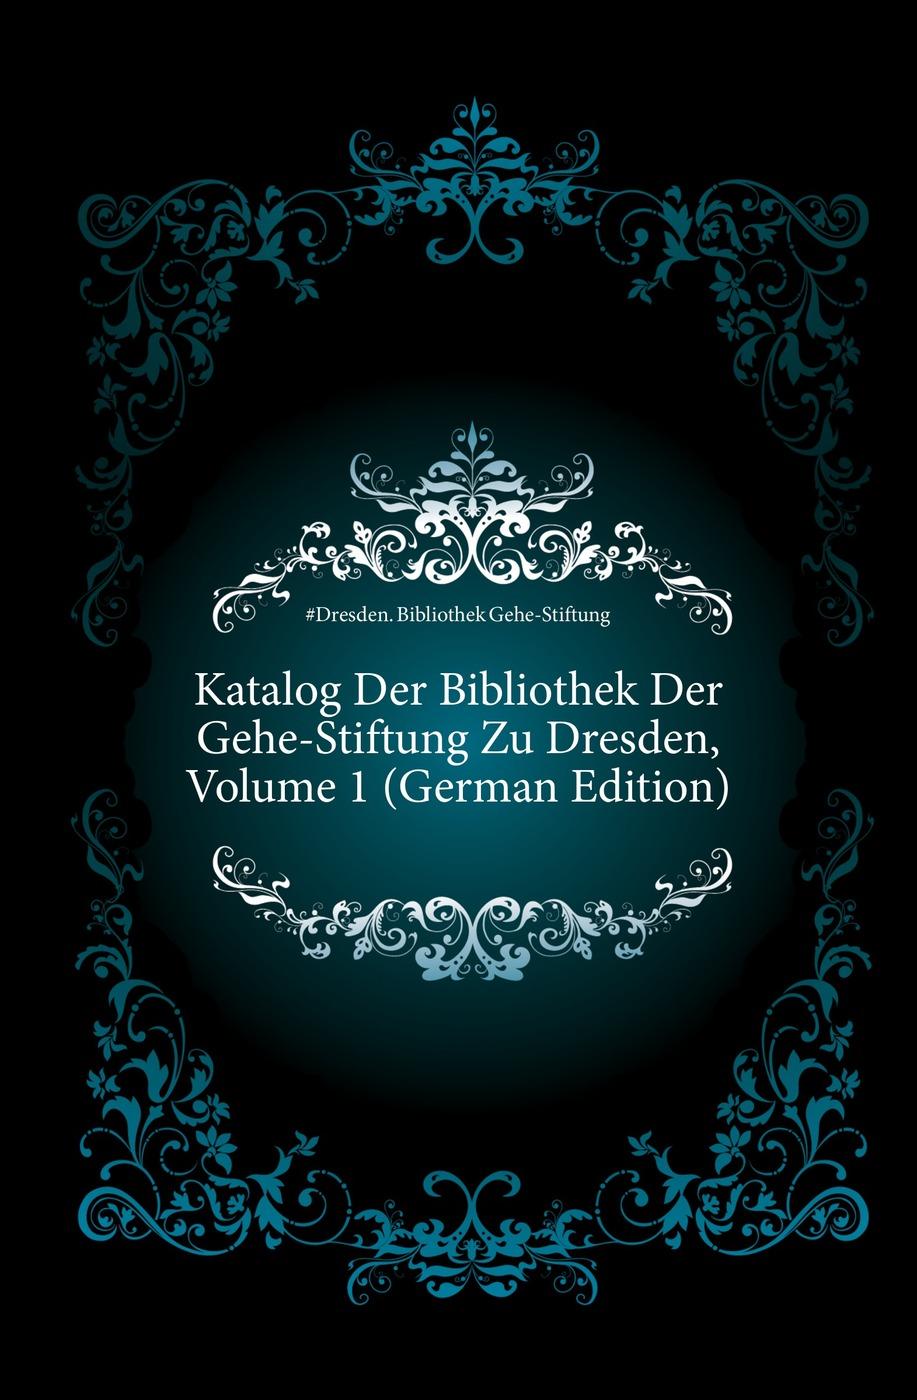 Katalog Der Bibliothek Der Gehe-Stiftung Zu Dresden, Volume 1 (German Edition) Эта книга — репринт оригинального...